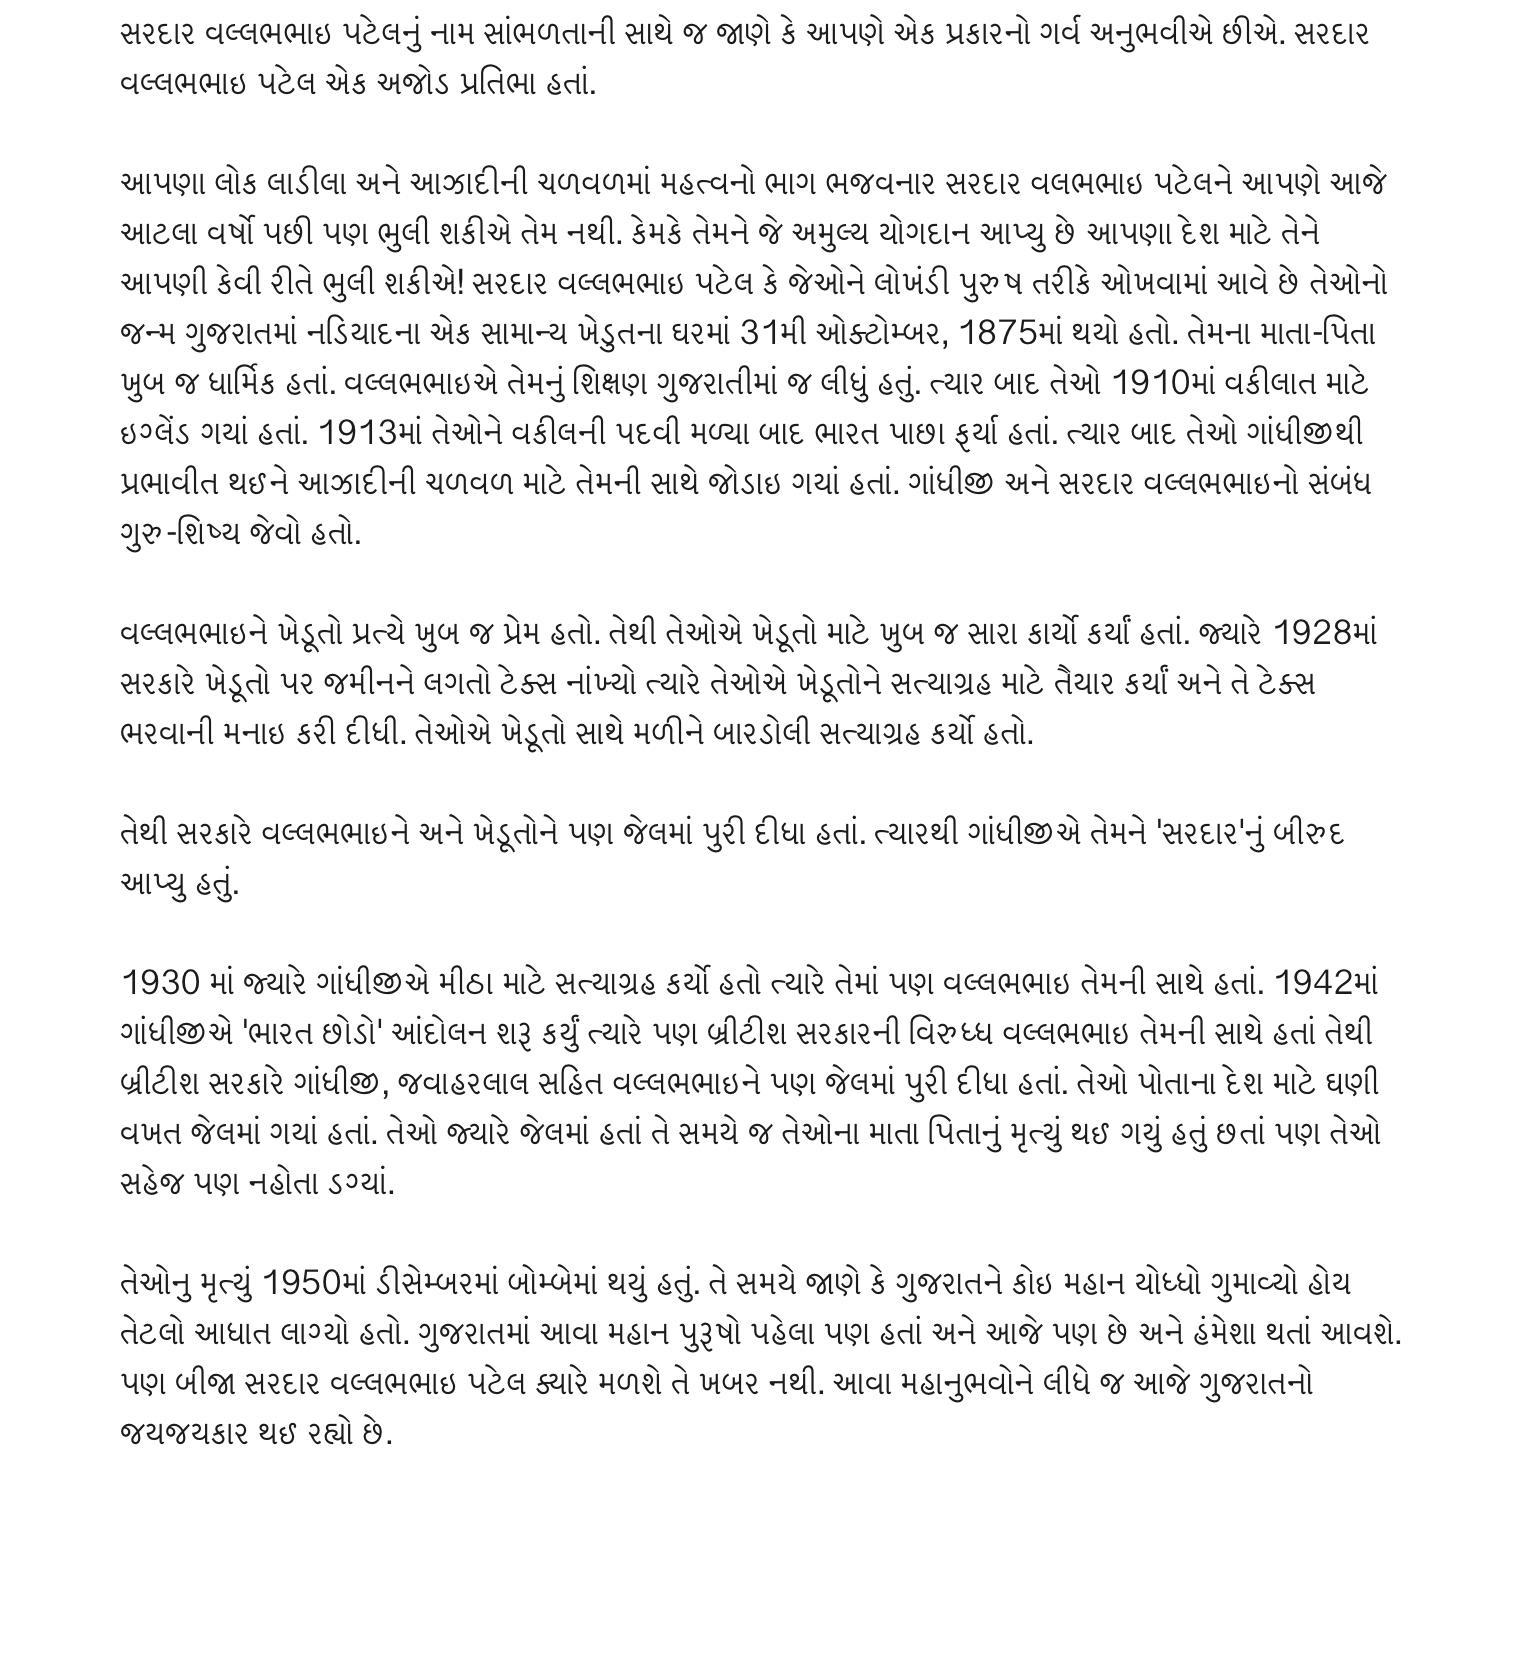 an essay on sardar vallabhbhai patel